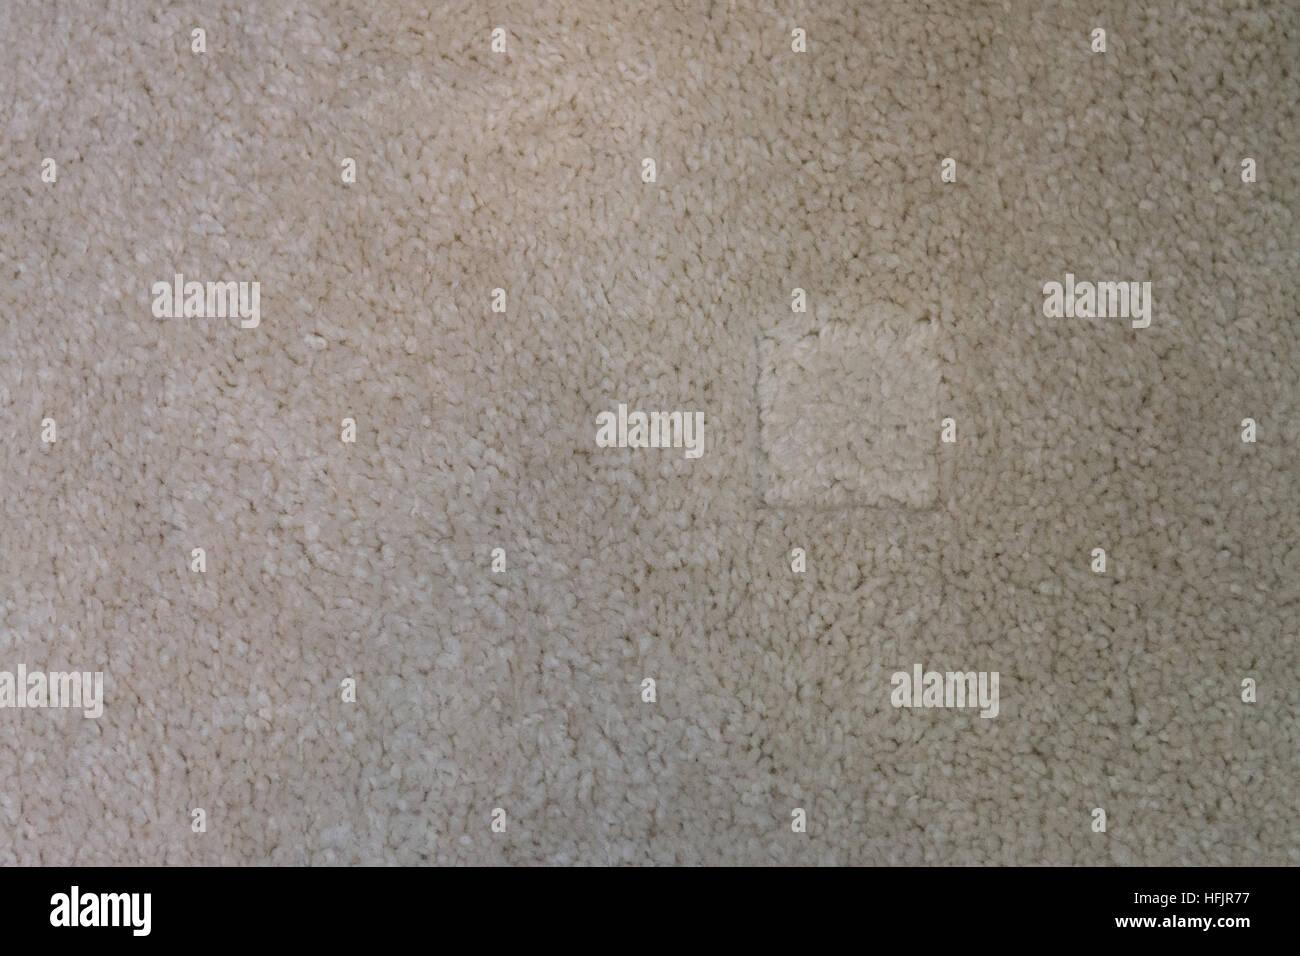 flattened carpet pile - Stock Image